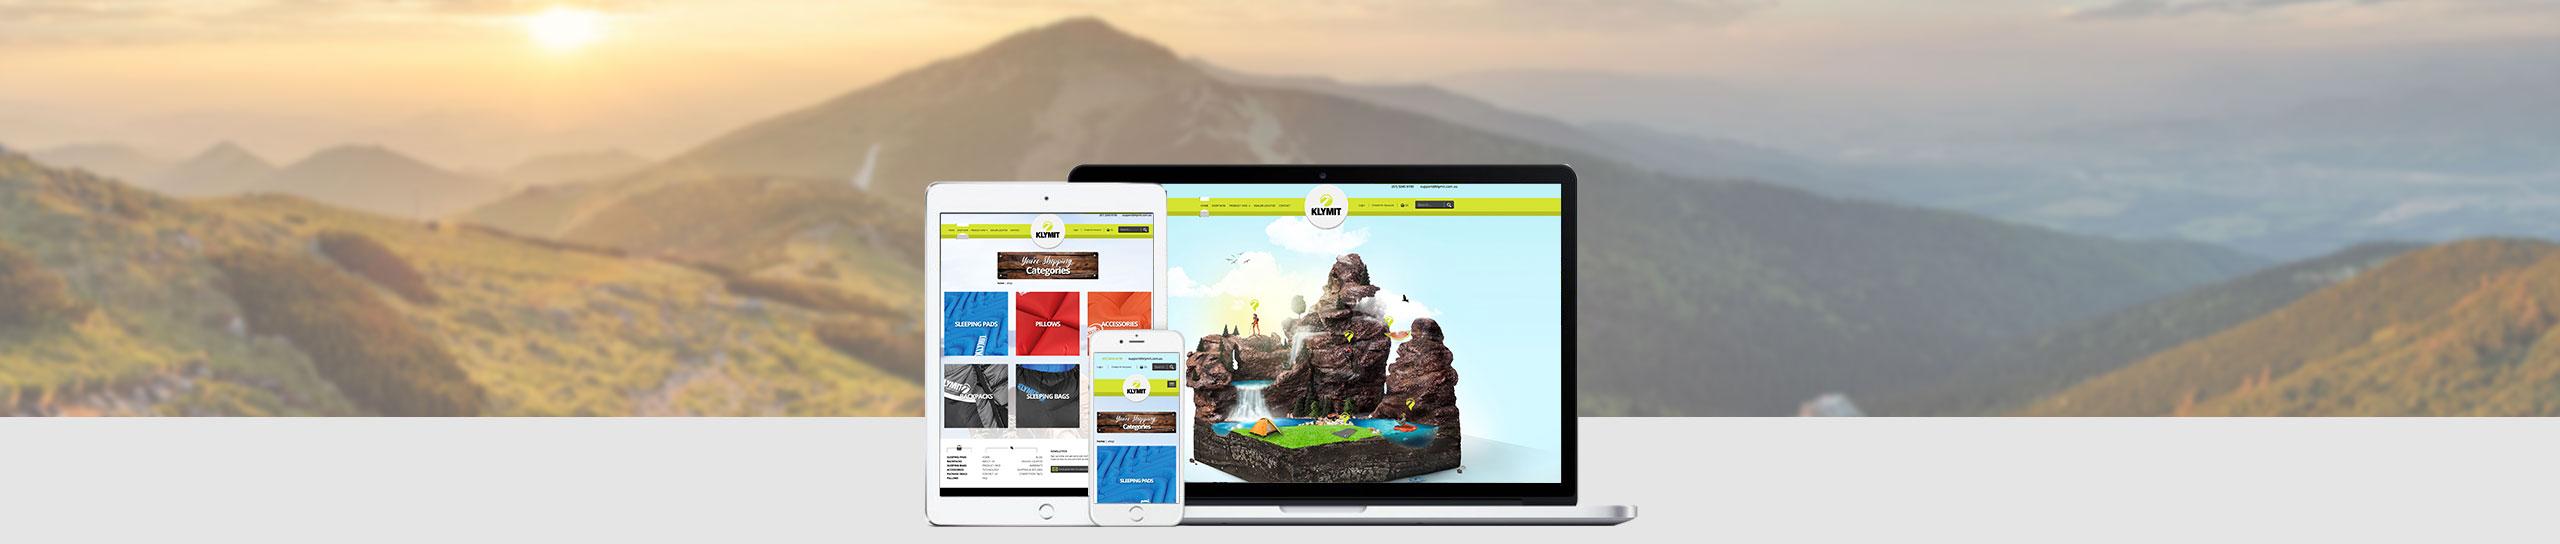 Klymit website displayed on multiple devices on mountain backdrop | website design brisbane